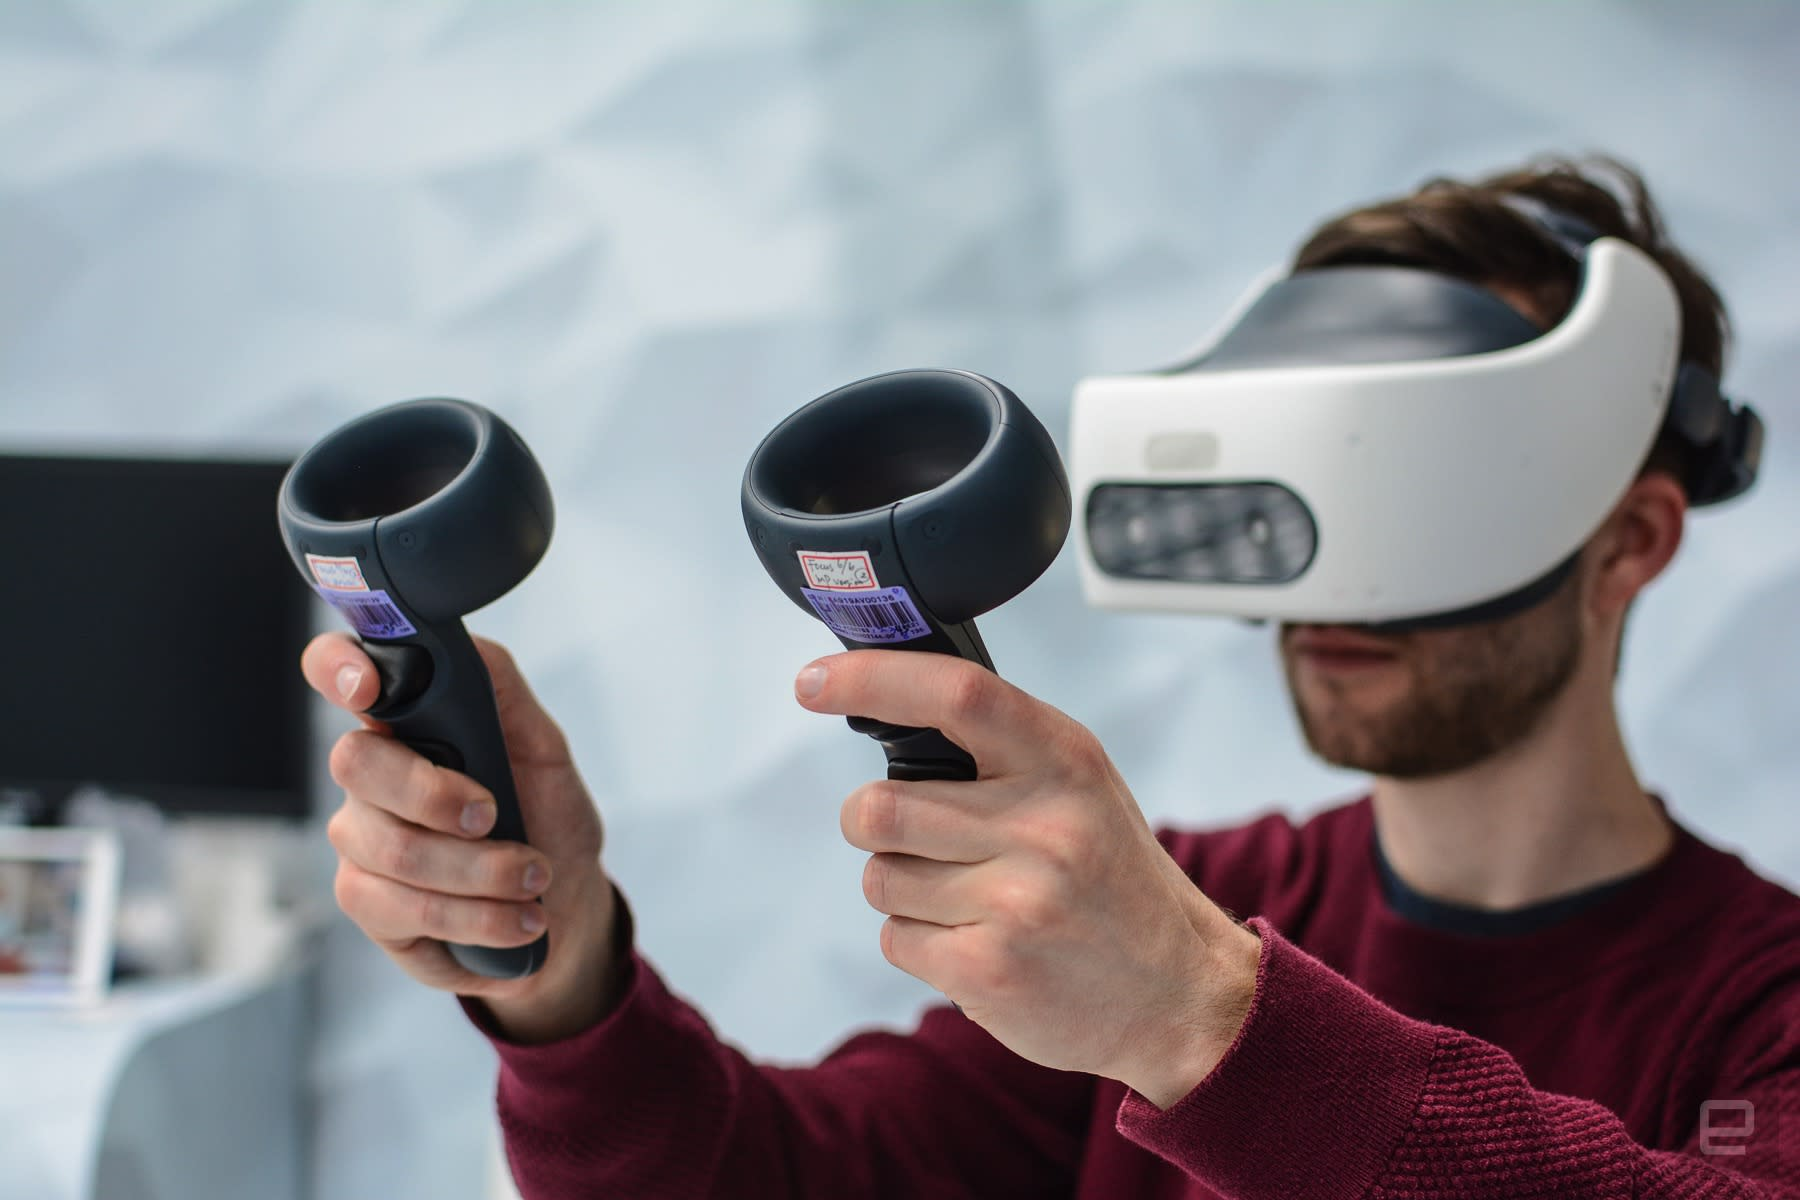 HTC's work-oriented Vive Focus Plus headset arrives mid